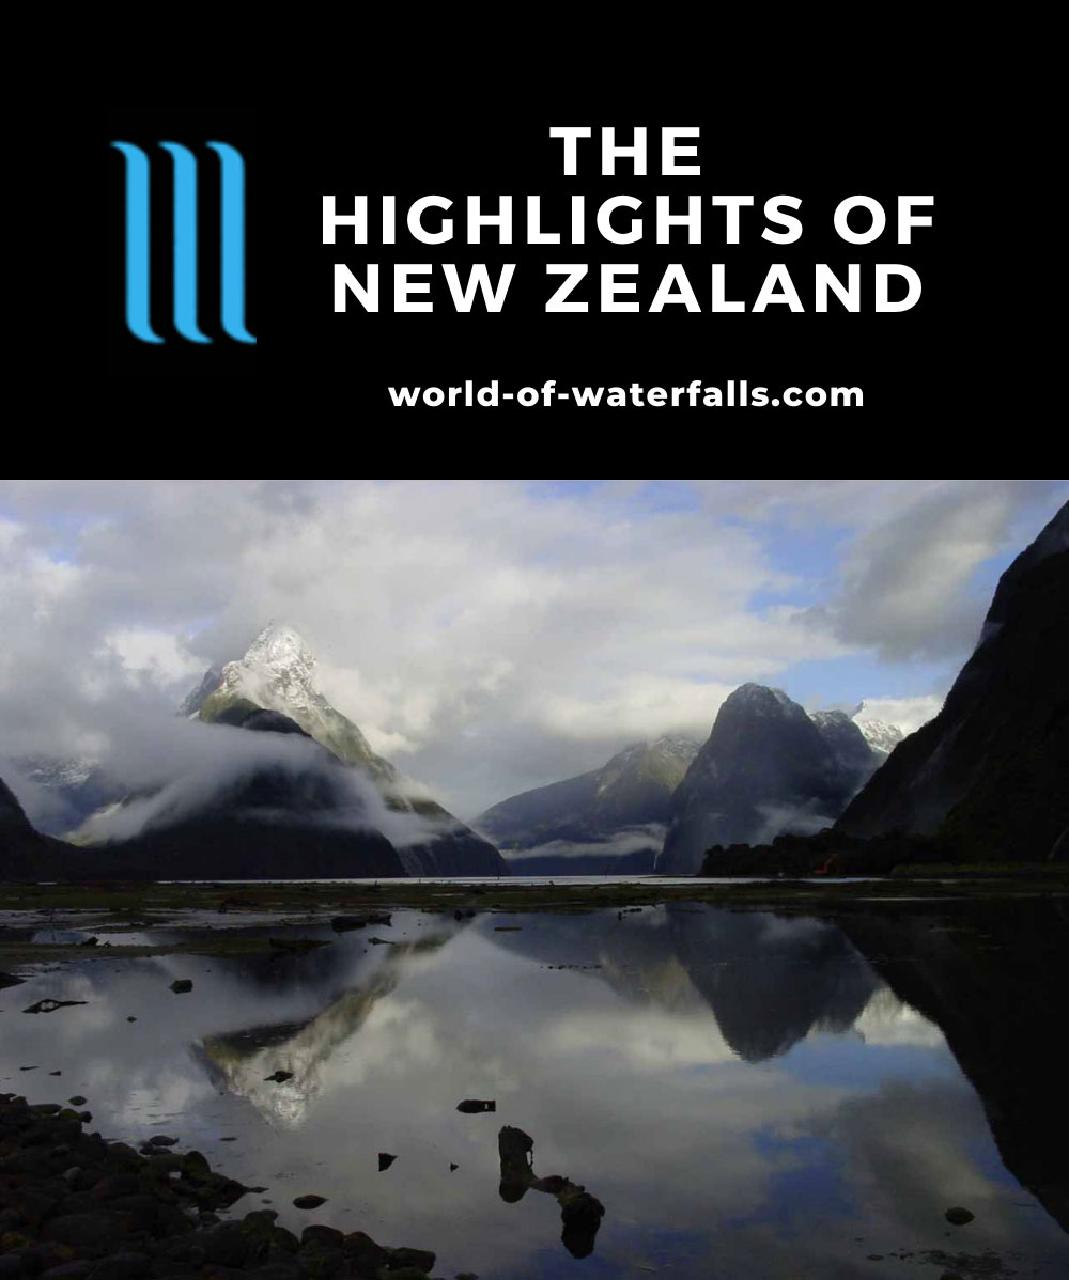 New Zealand Highlights